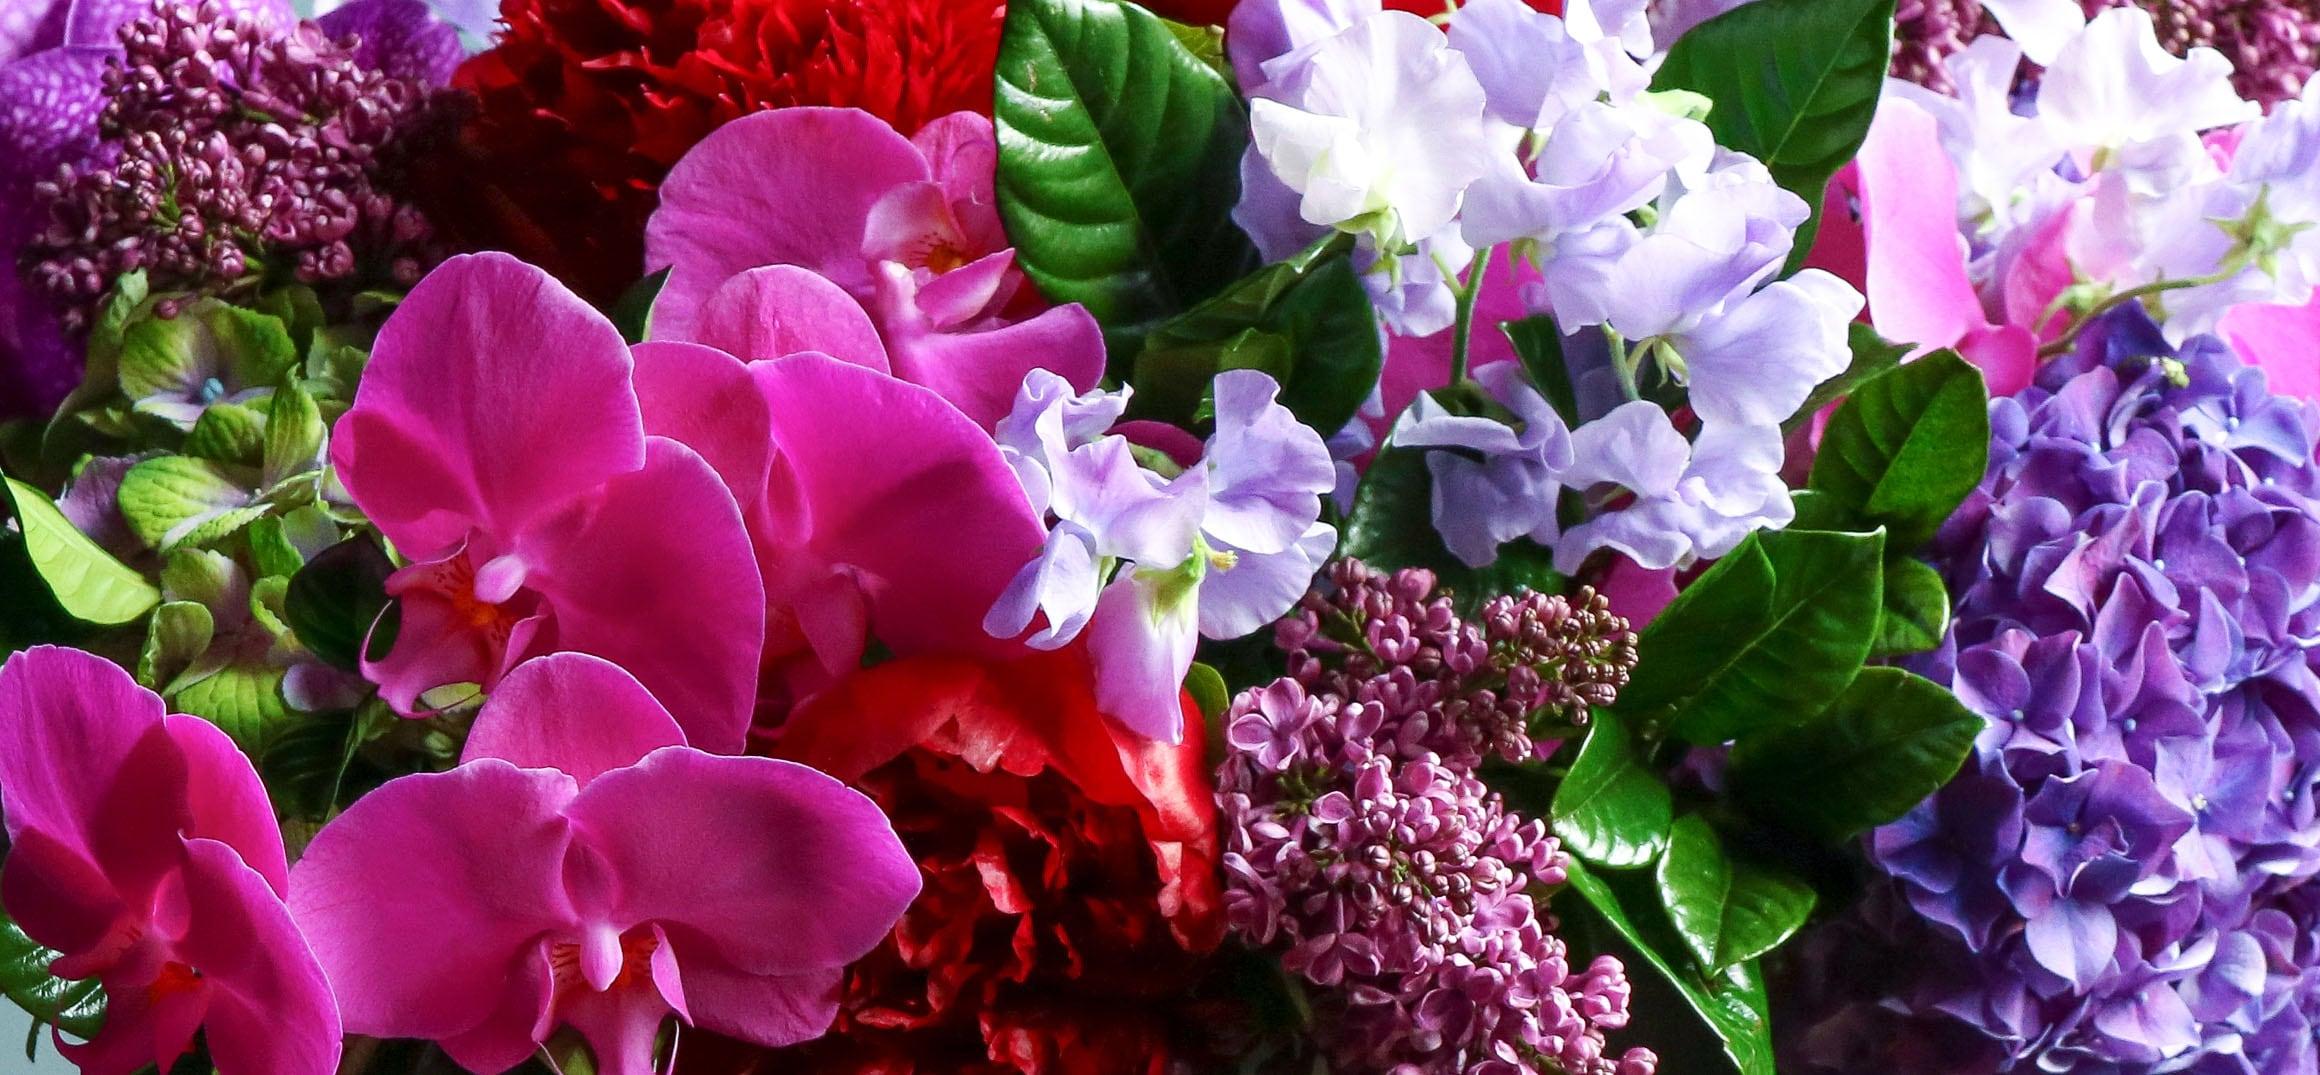 Luxe Flowers & Luxury arrangement delivery